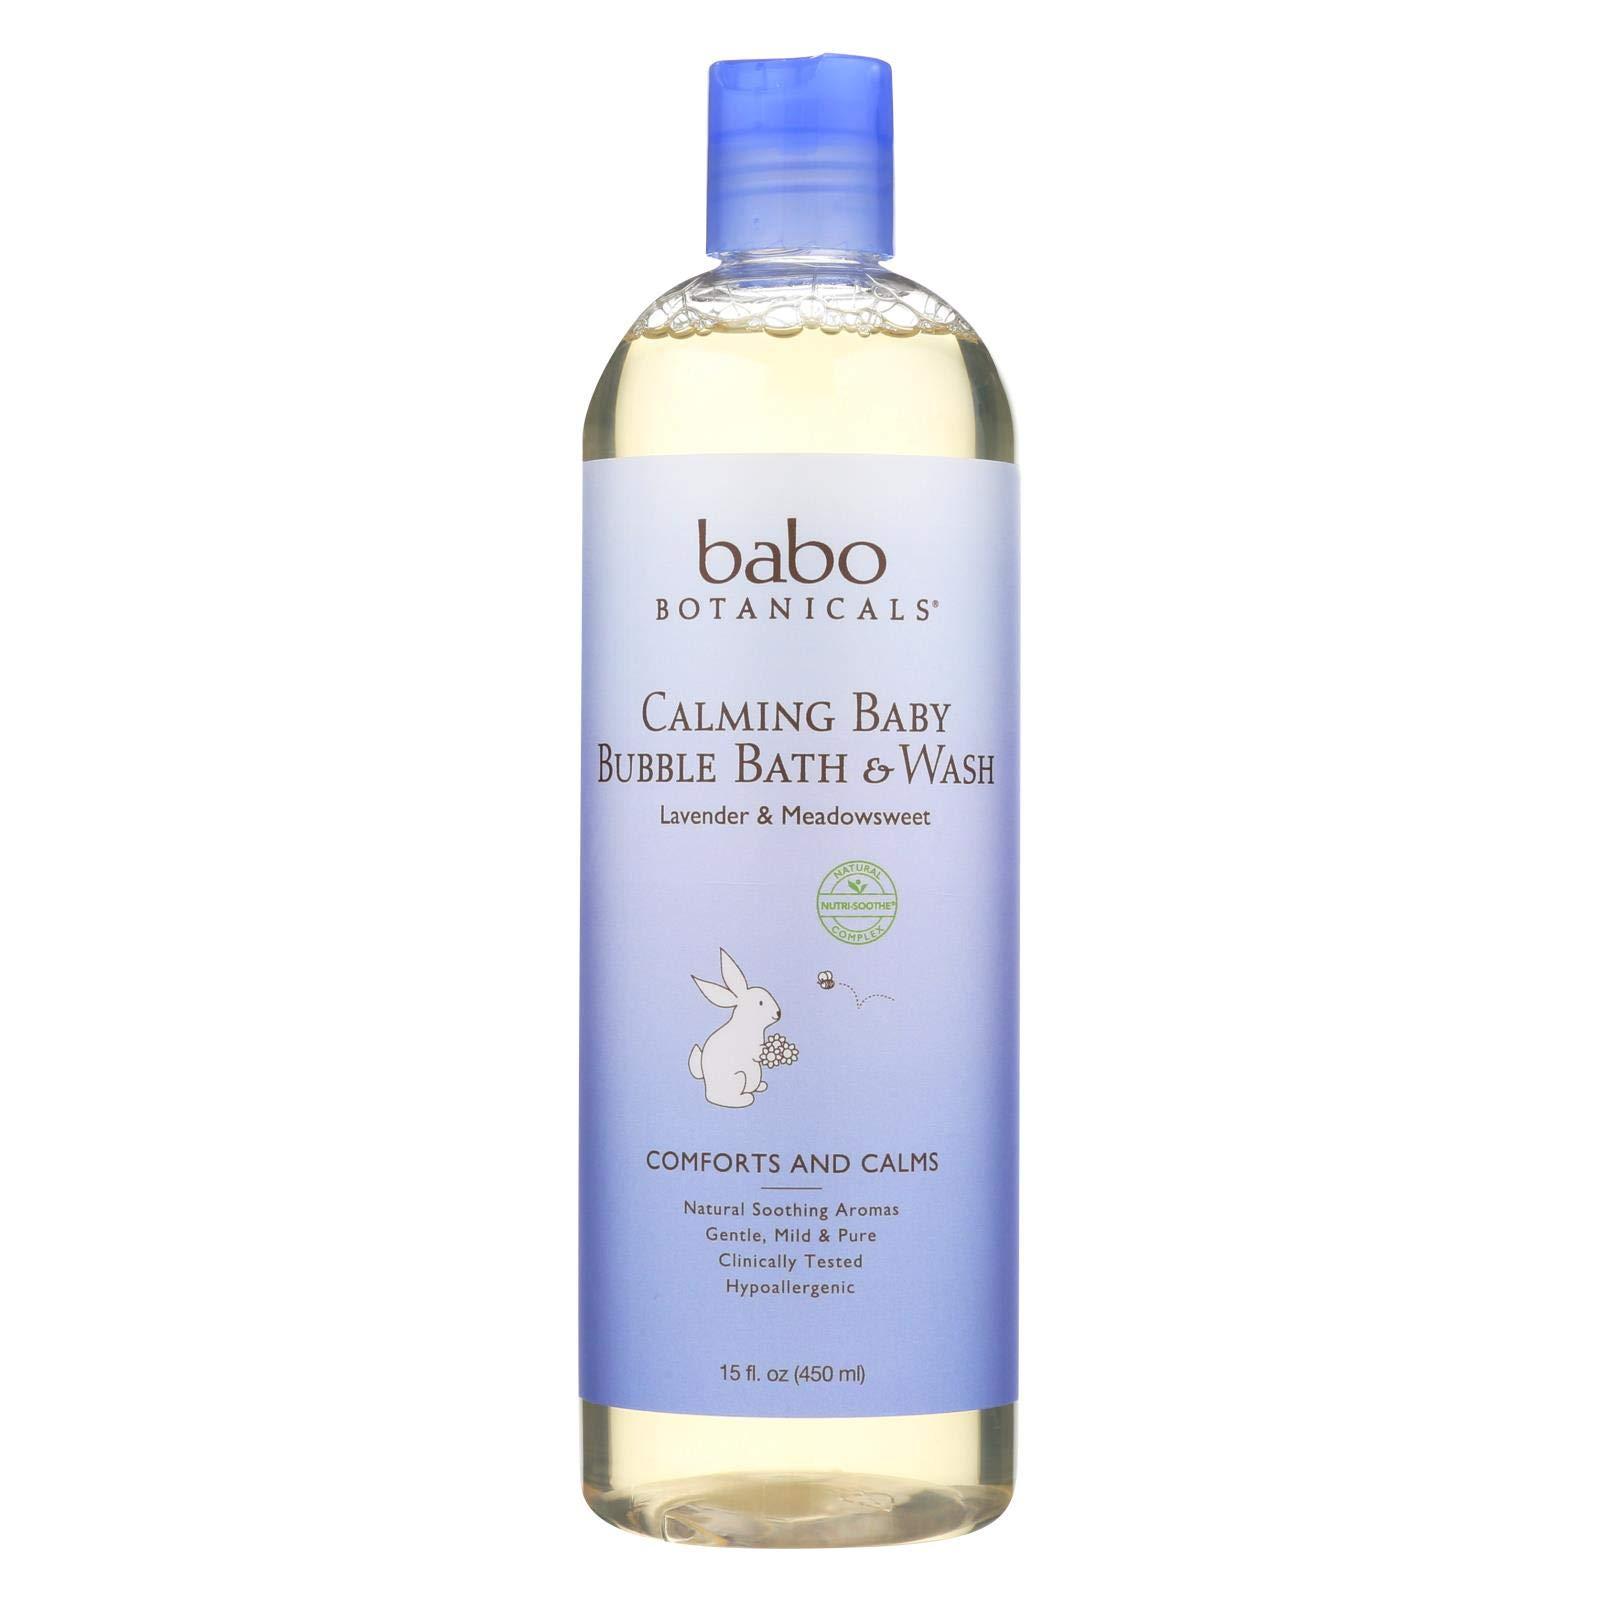 Babo Botanicals Shampoo Bubblebath and Wash - Calming - Lavender - 15 oz (Pack of 6) by Babo Botanicals